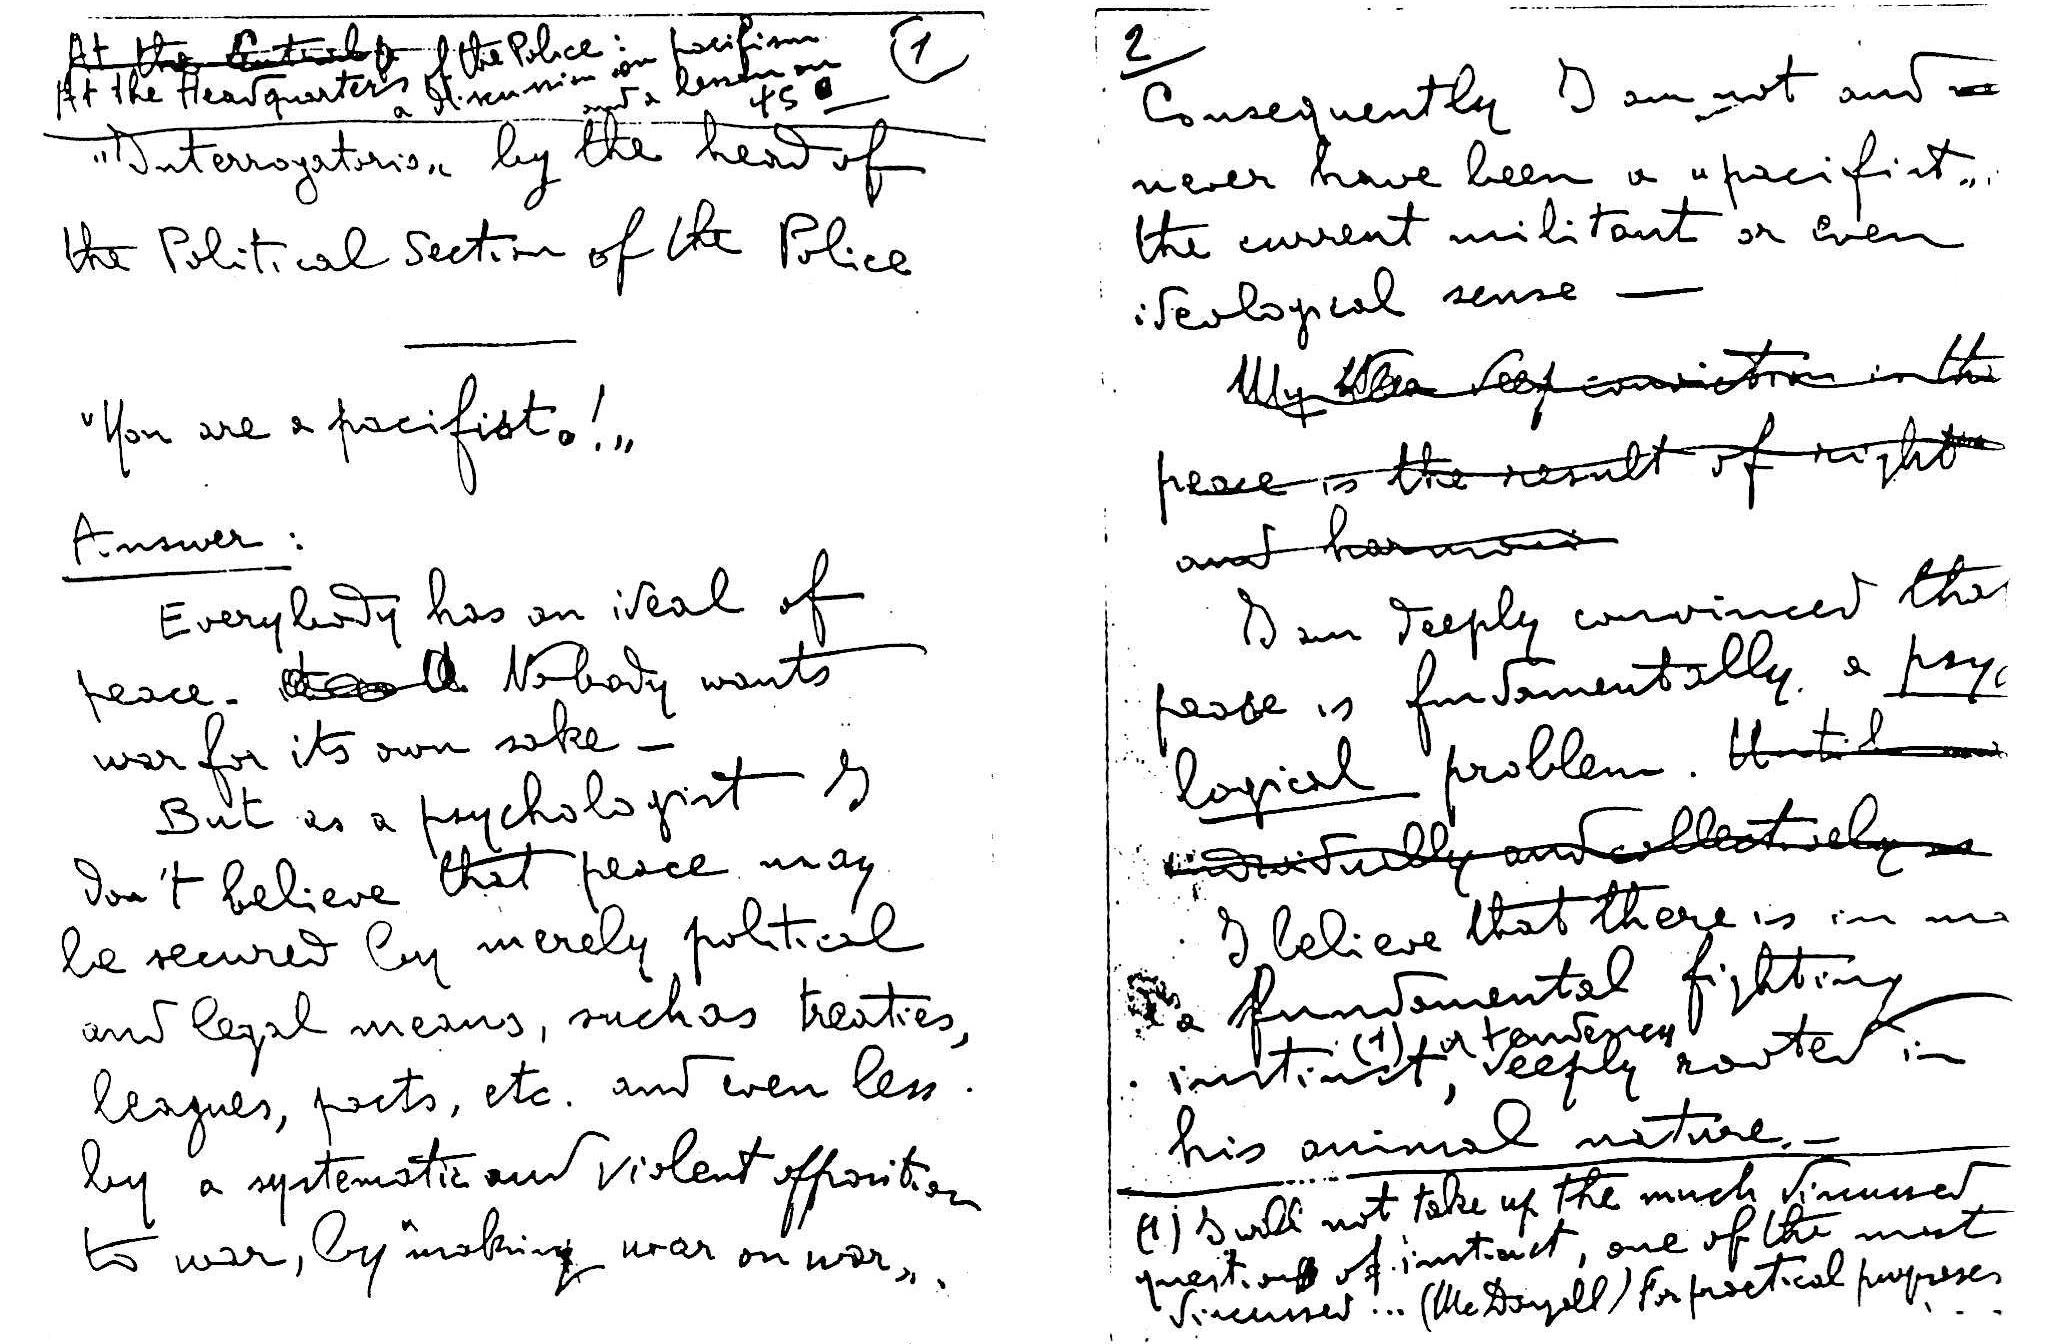 Assagiolis writing about jail